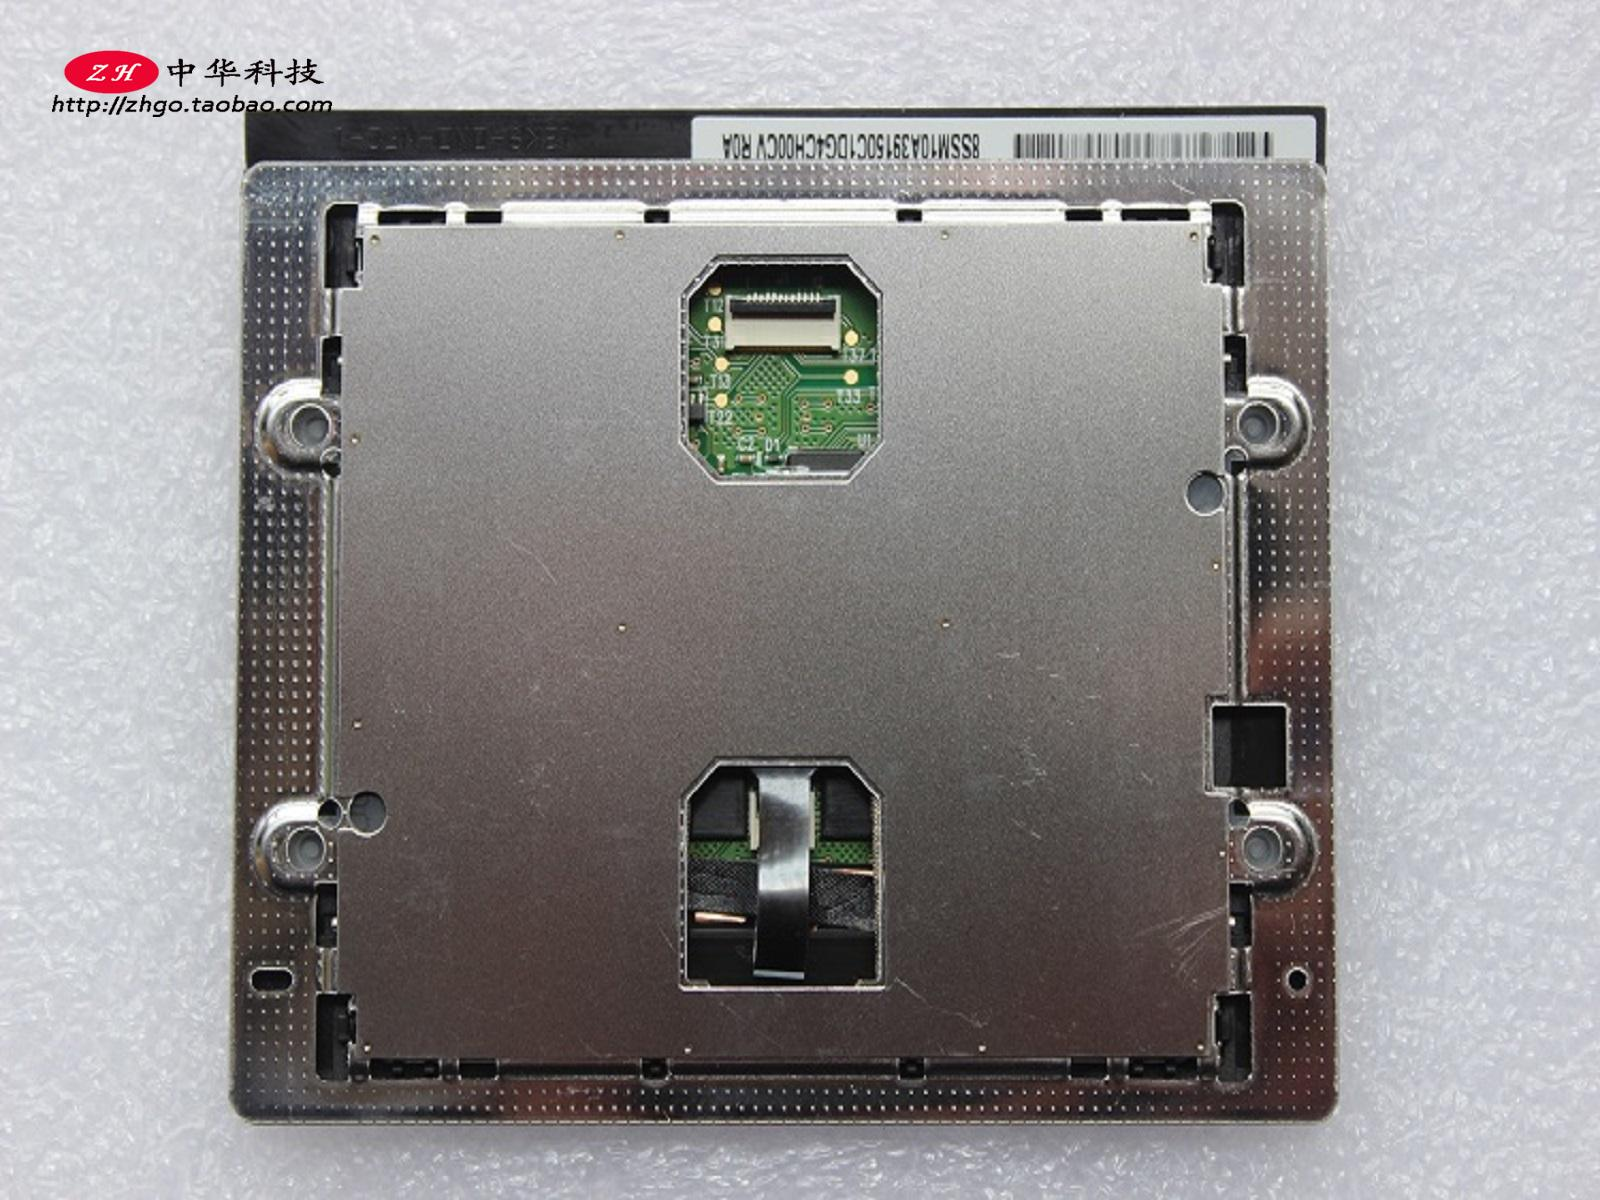 Brand new original Thinkpad Lenovo x230s X240 X240S S1 Yoga 12 touchpad